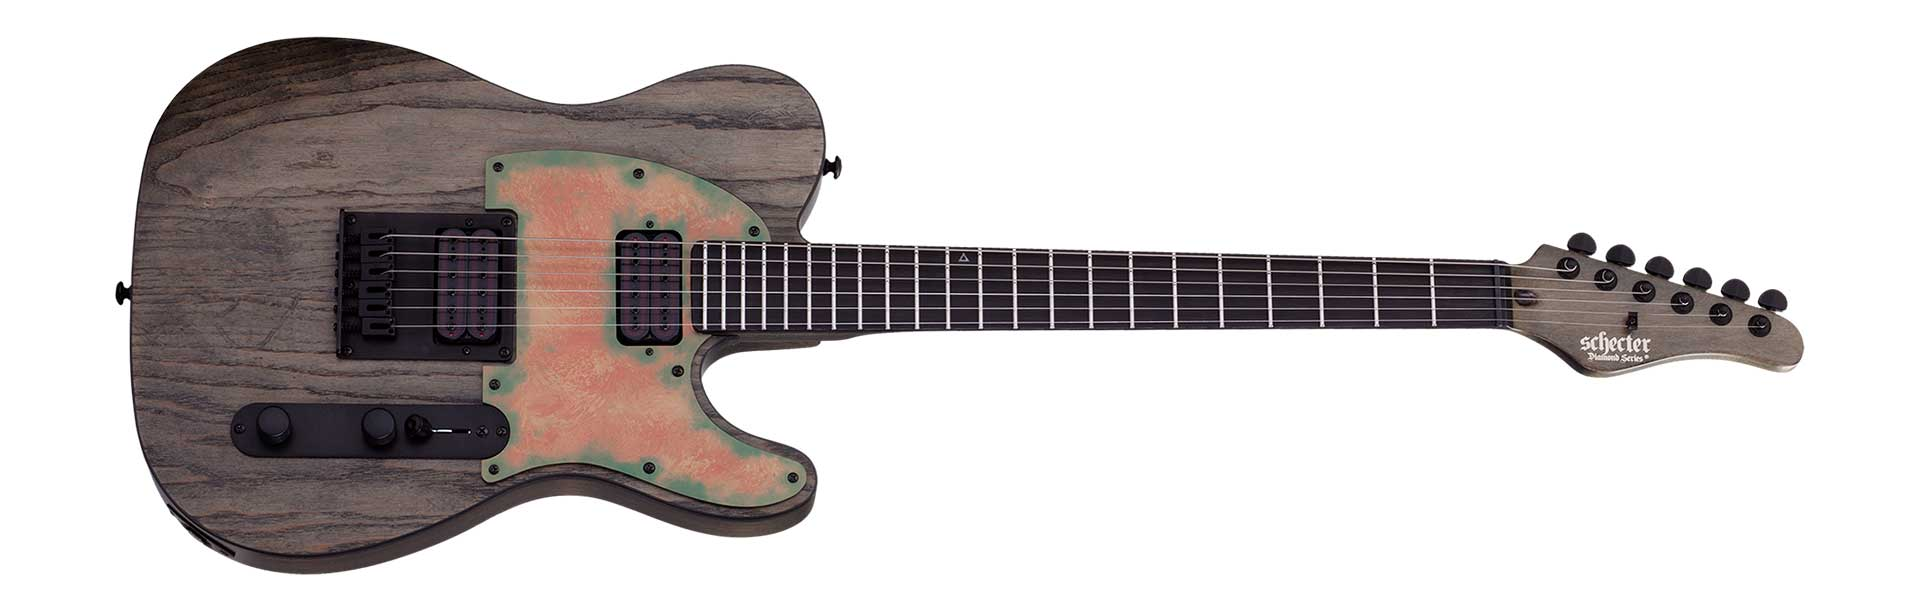 Schecter Announce New 2018 Guitar Series!